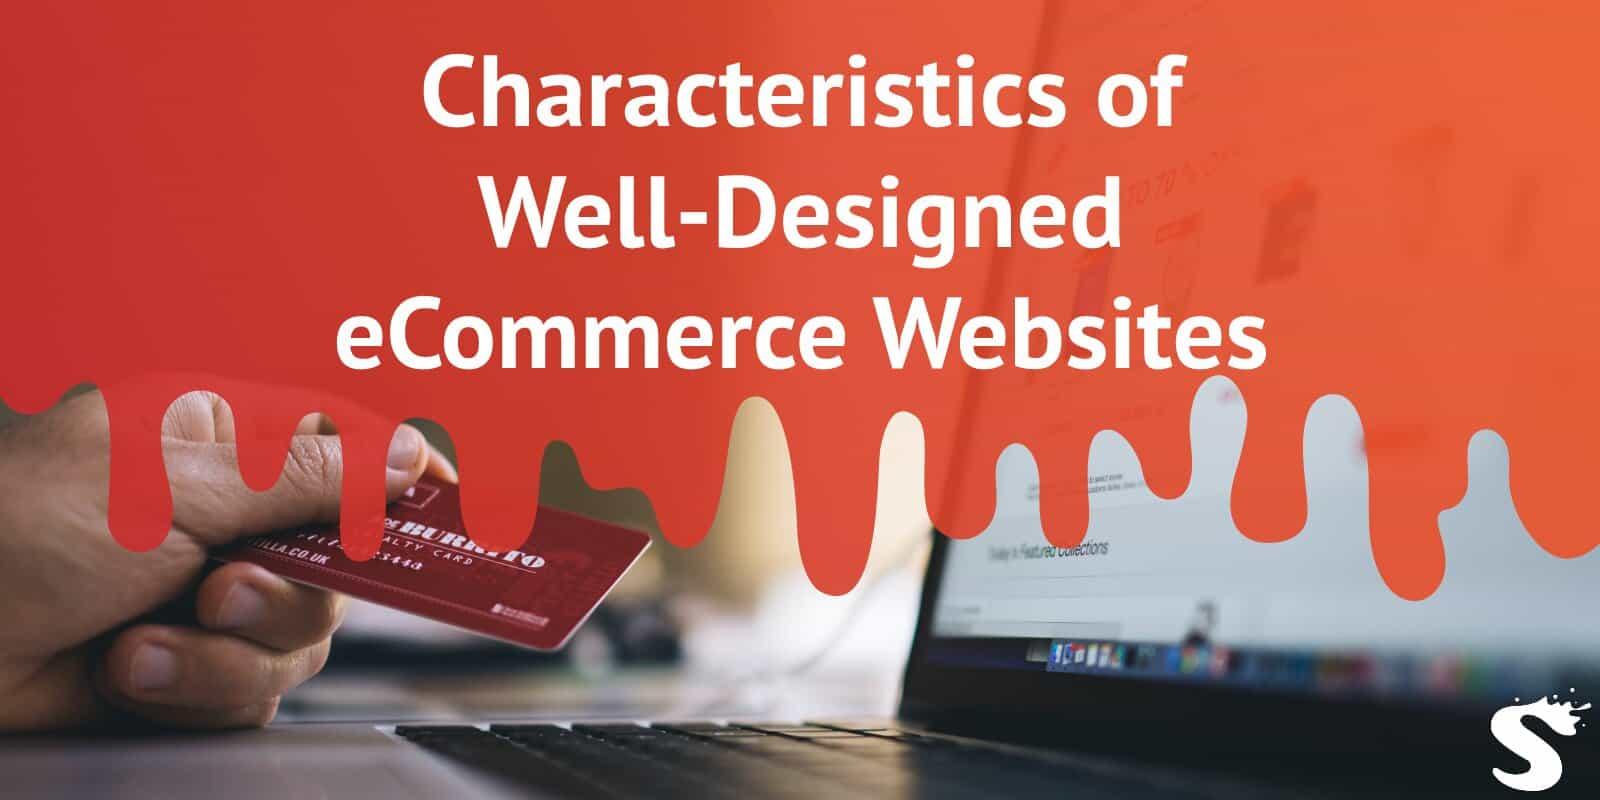 Characteristics of Well-designed E-commerce Websites